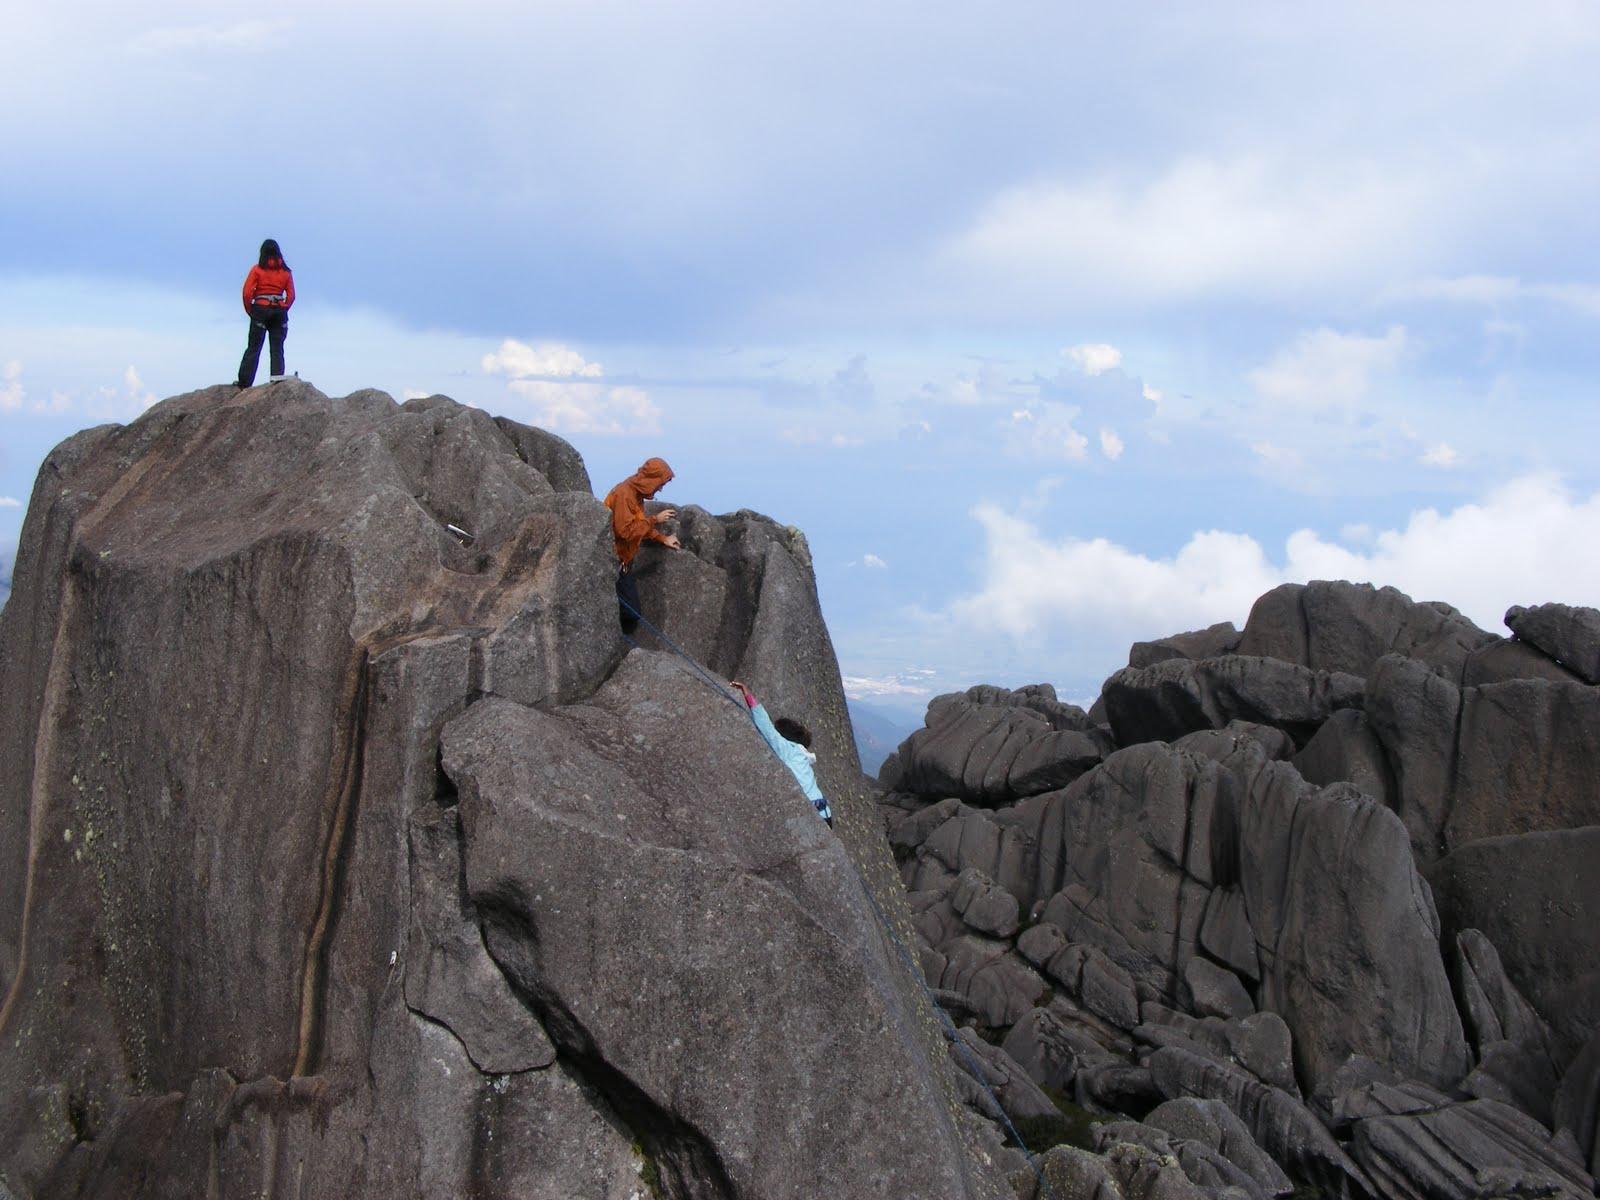 Climbing the Pico das Agulhas Negras in Itatiaia